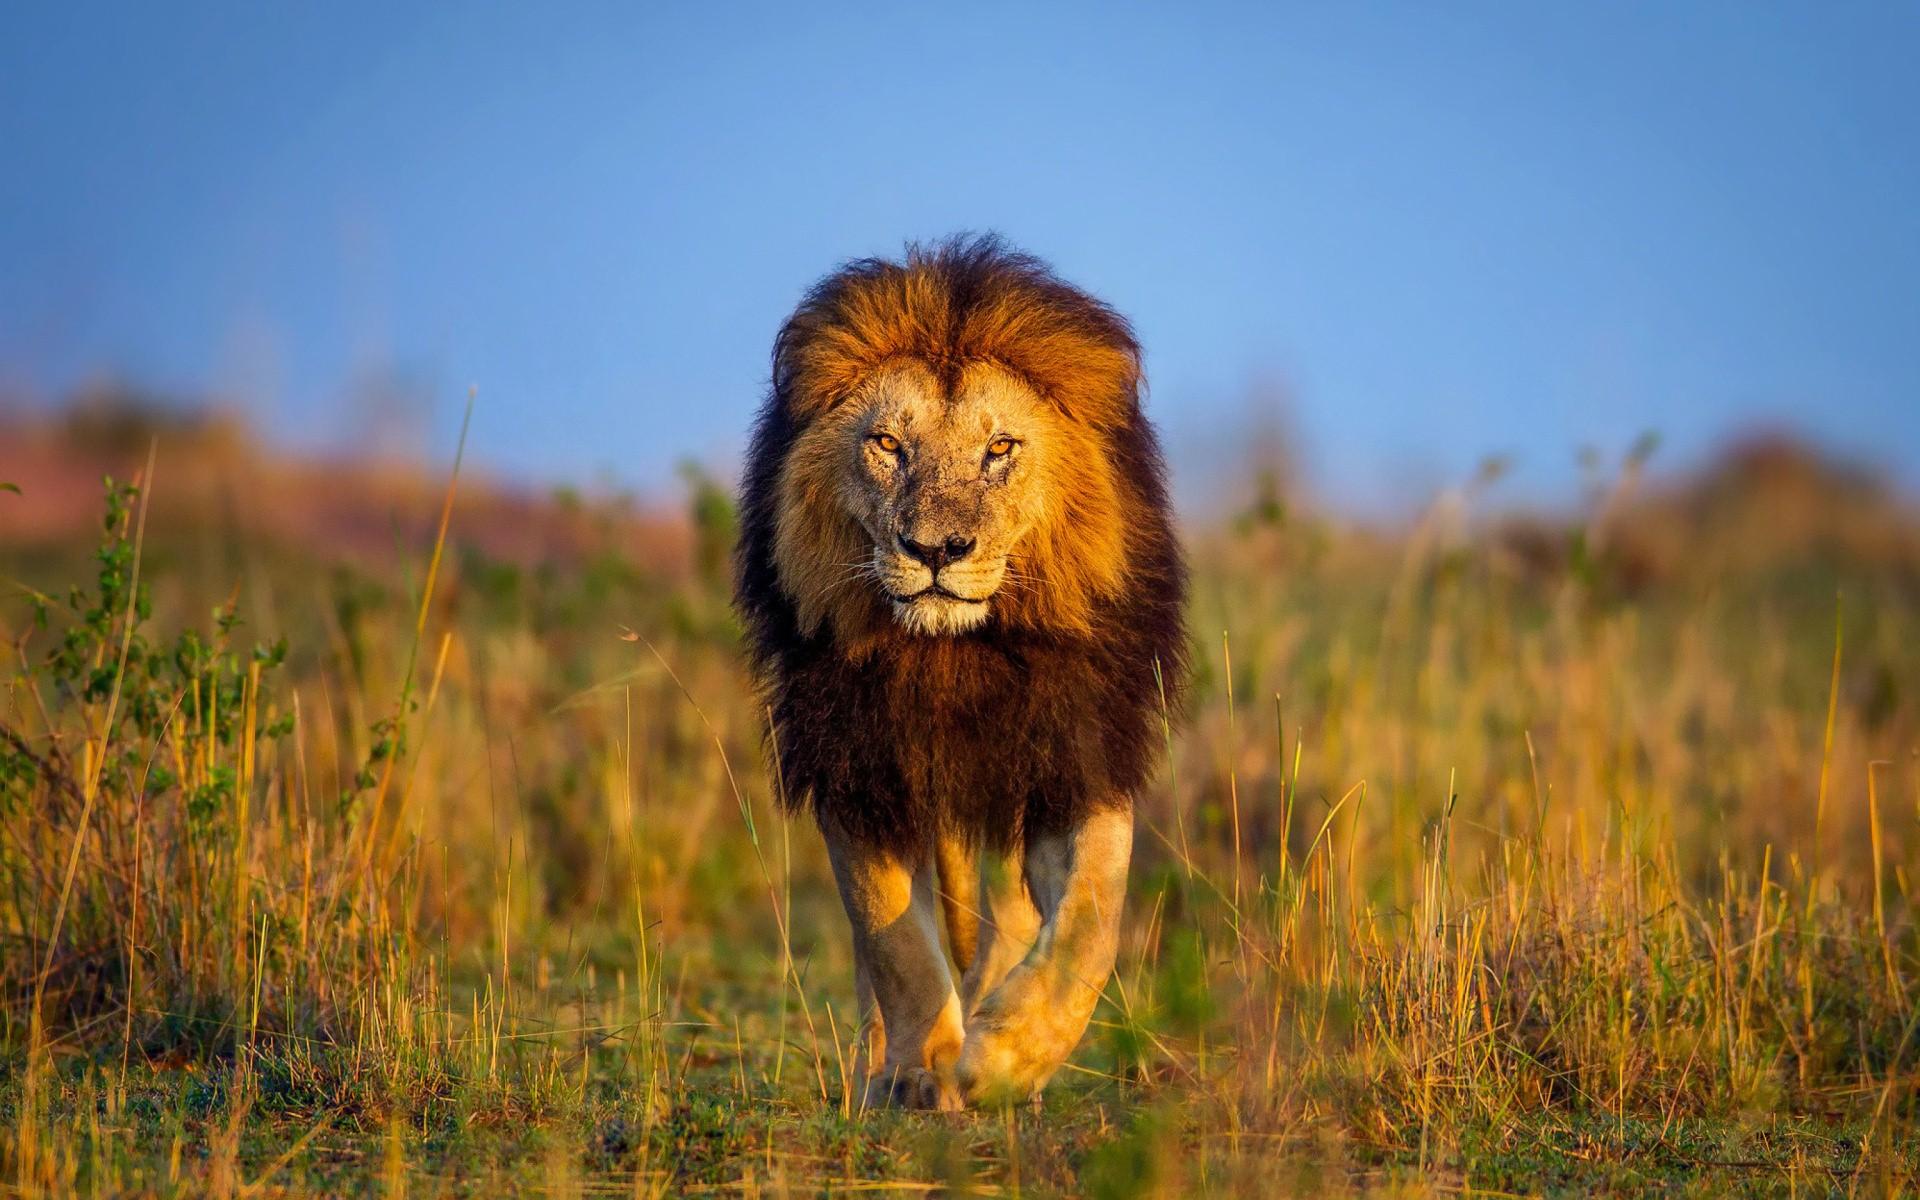 Master Walk Lion Photo Hd Wallpapaer Download Images